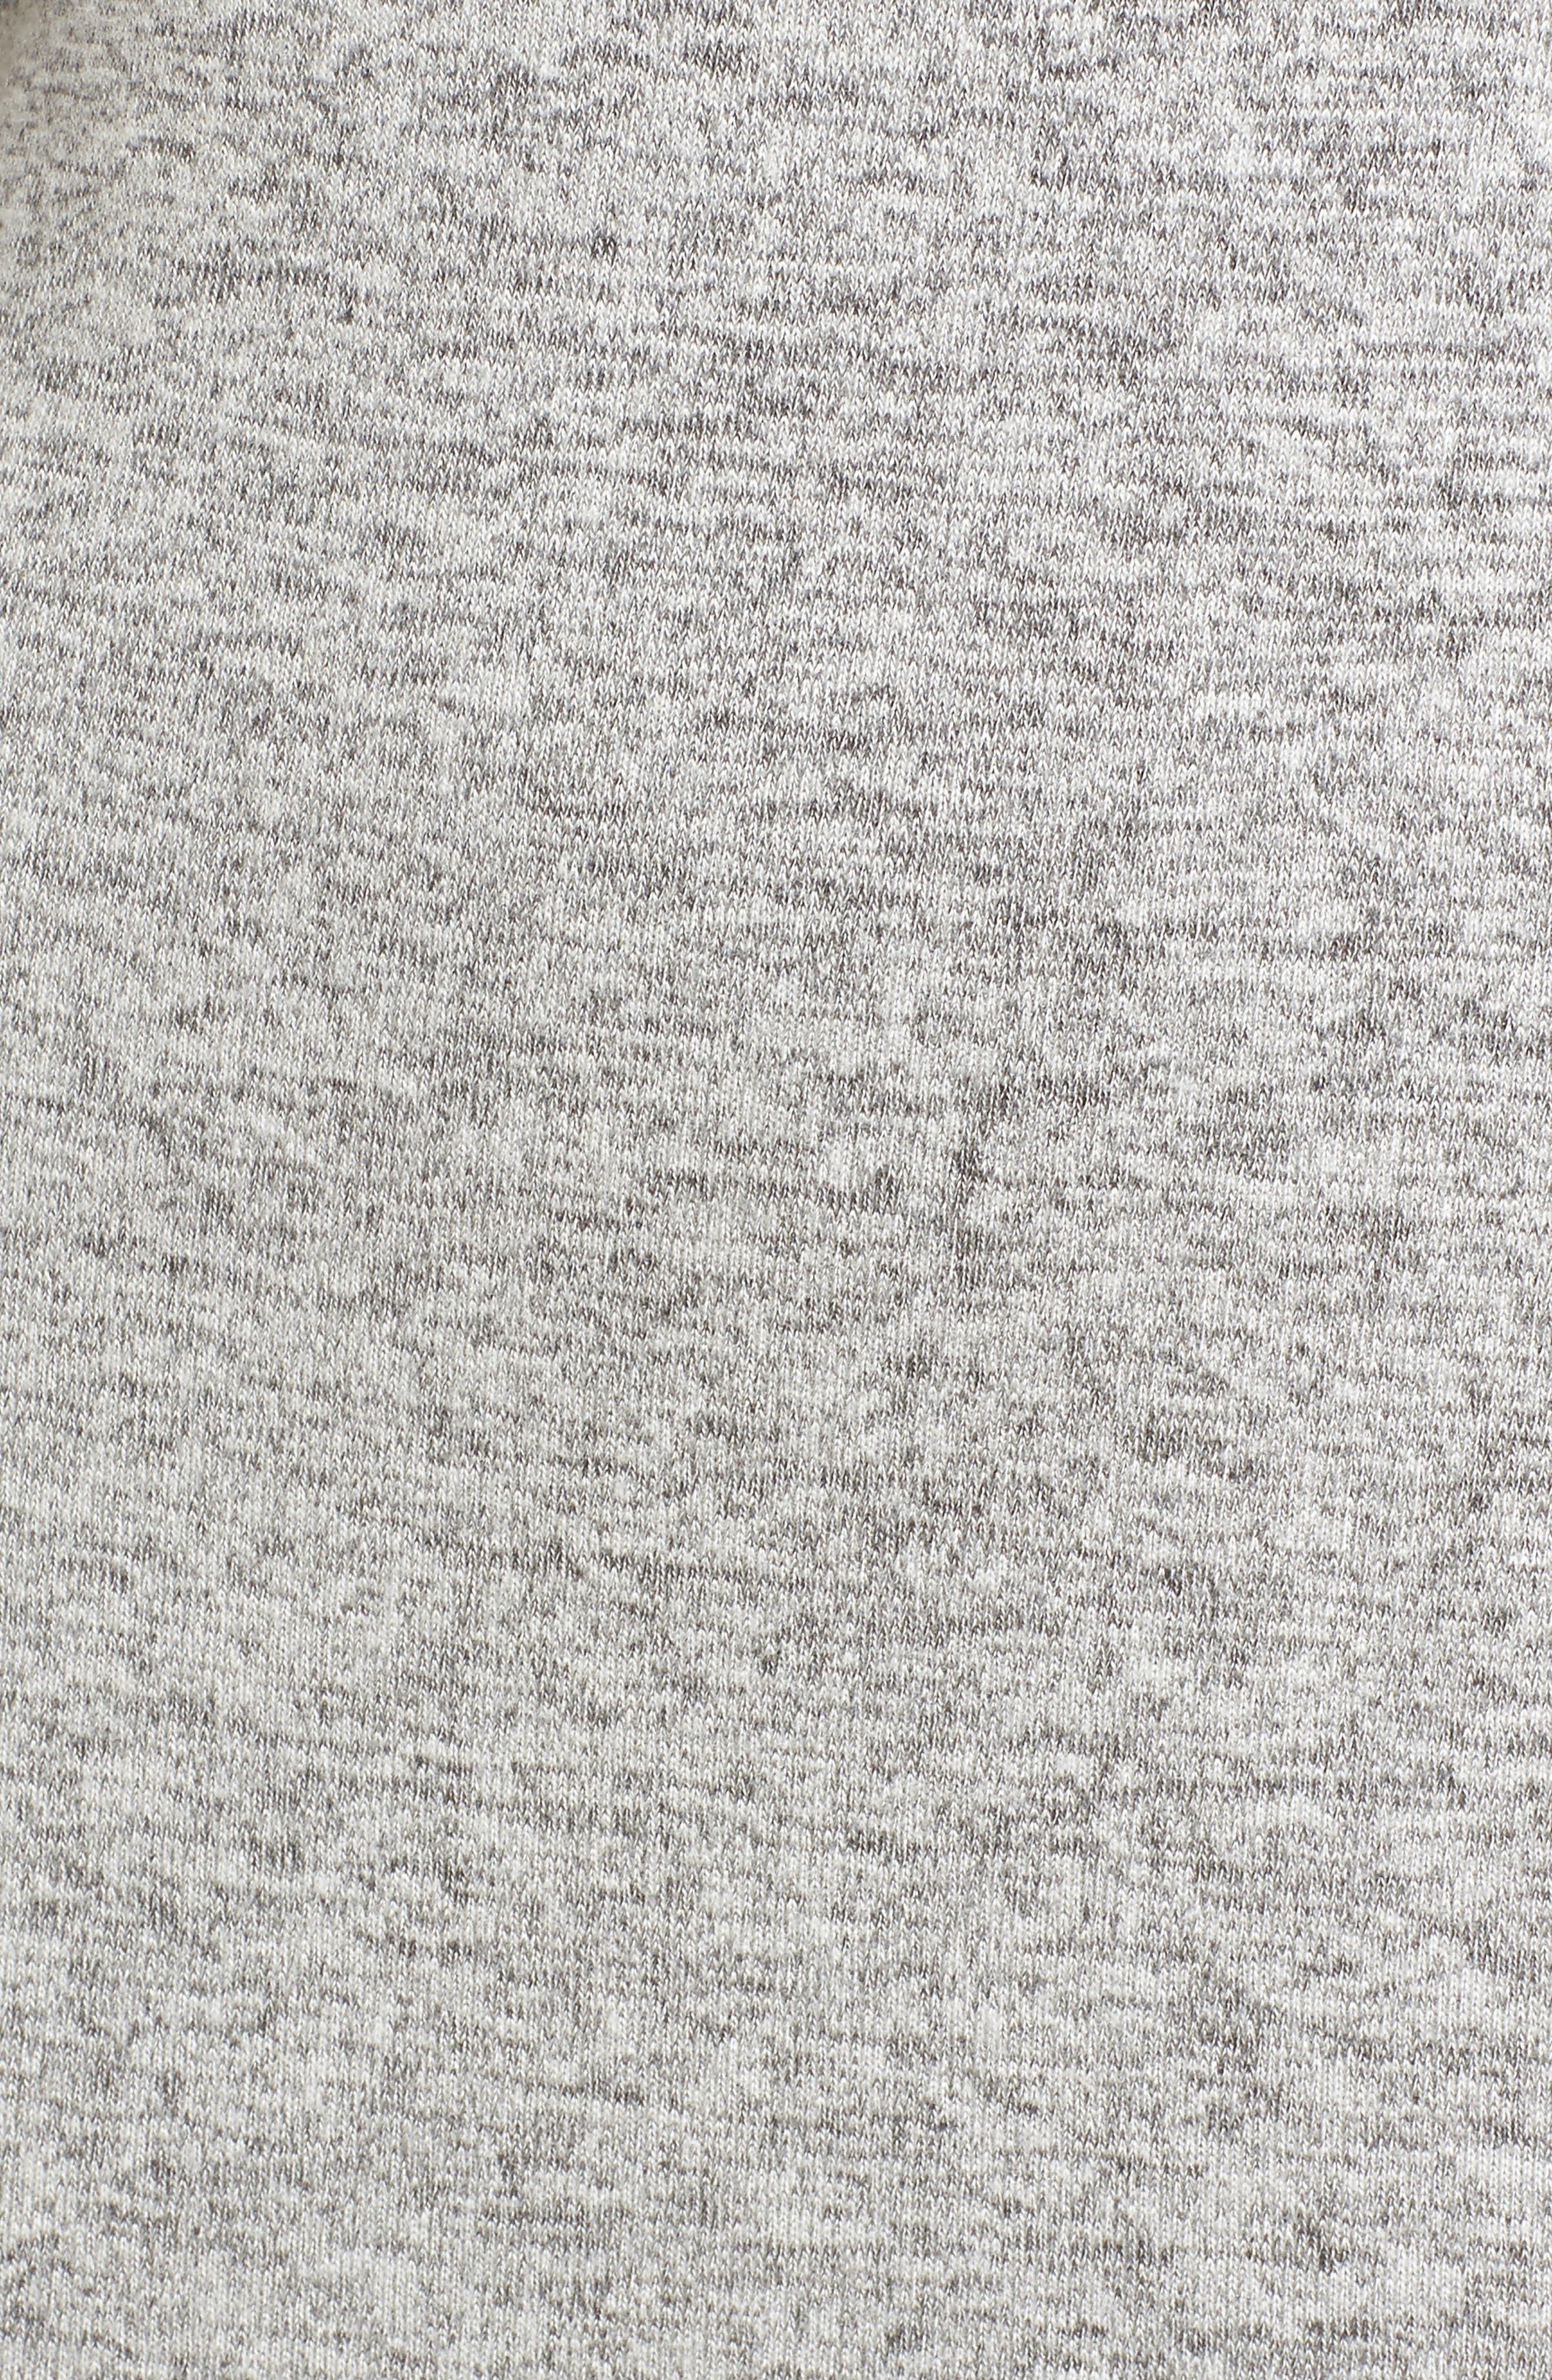 Off the Shoulder Sweater Dress,                             Alternate thumbnail 5, color,                             H GREY